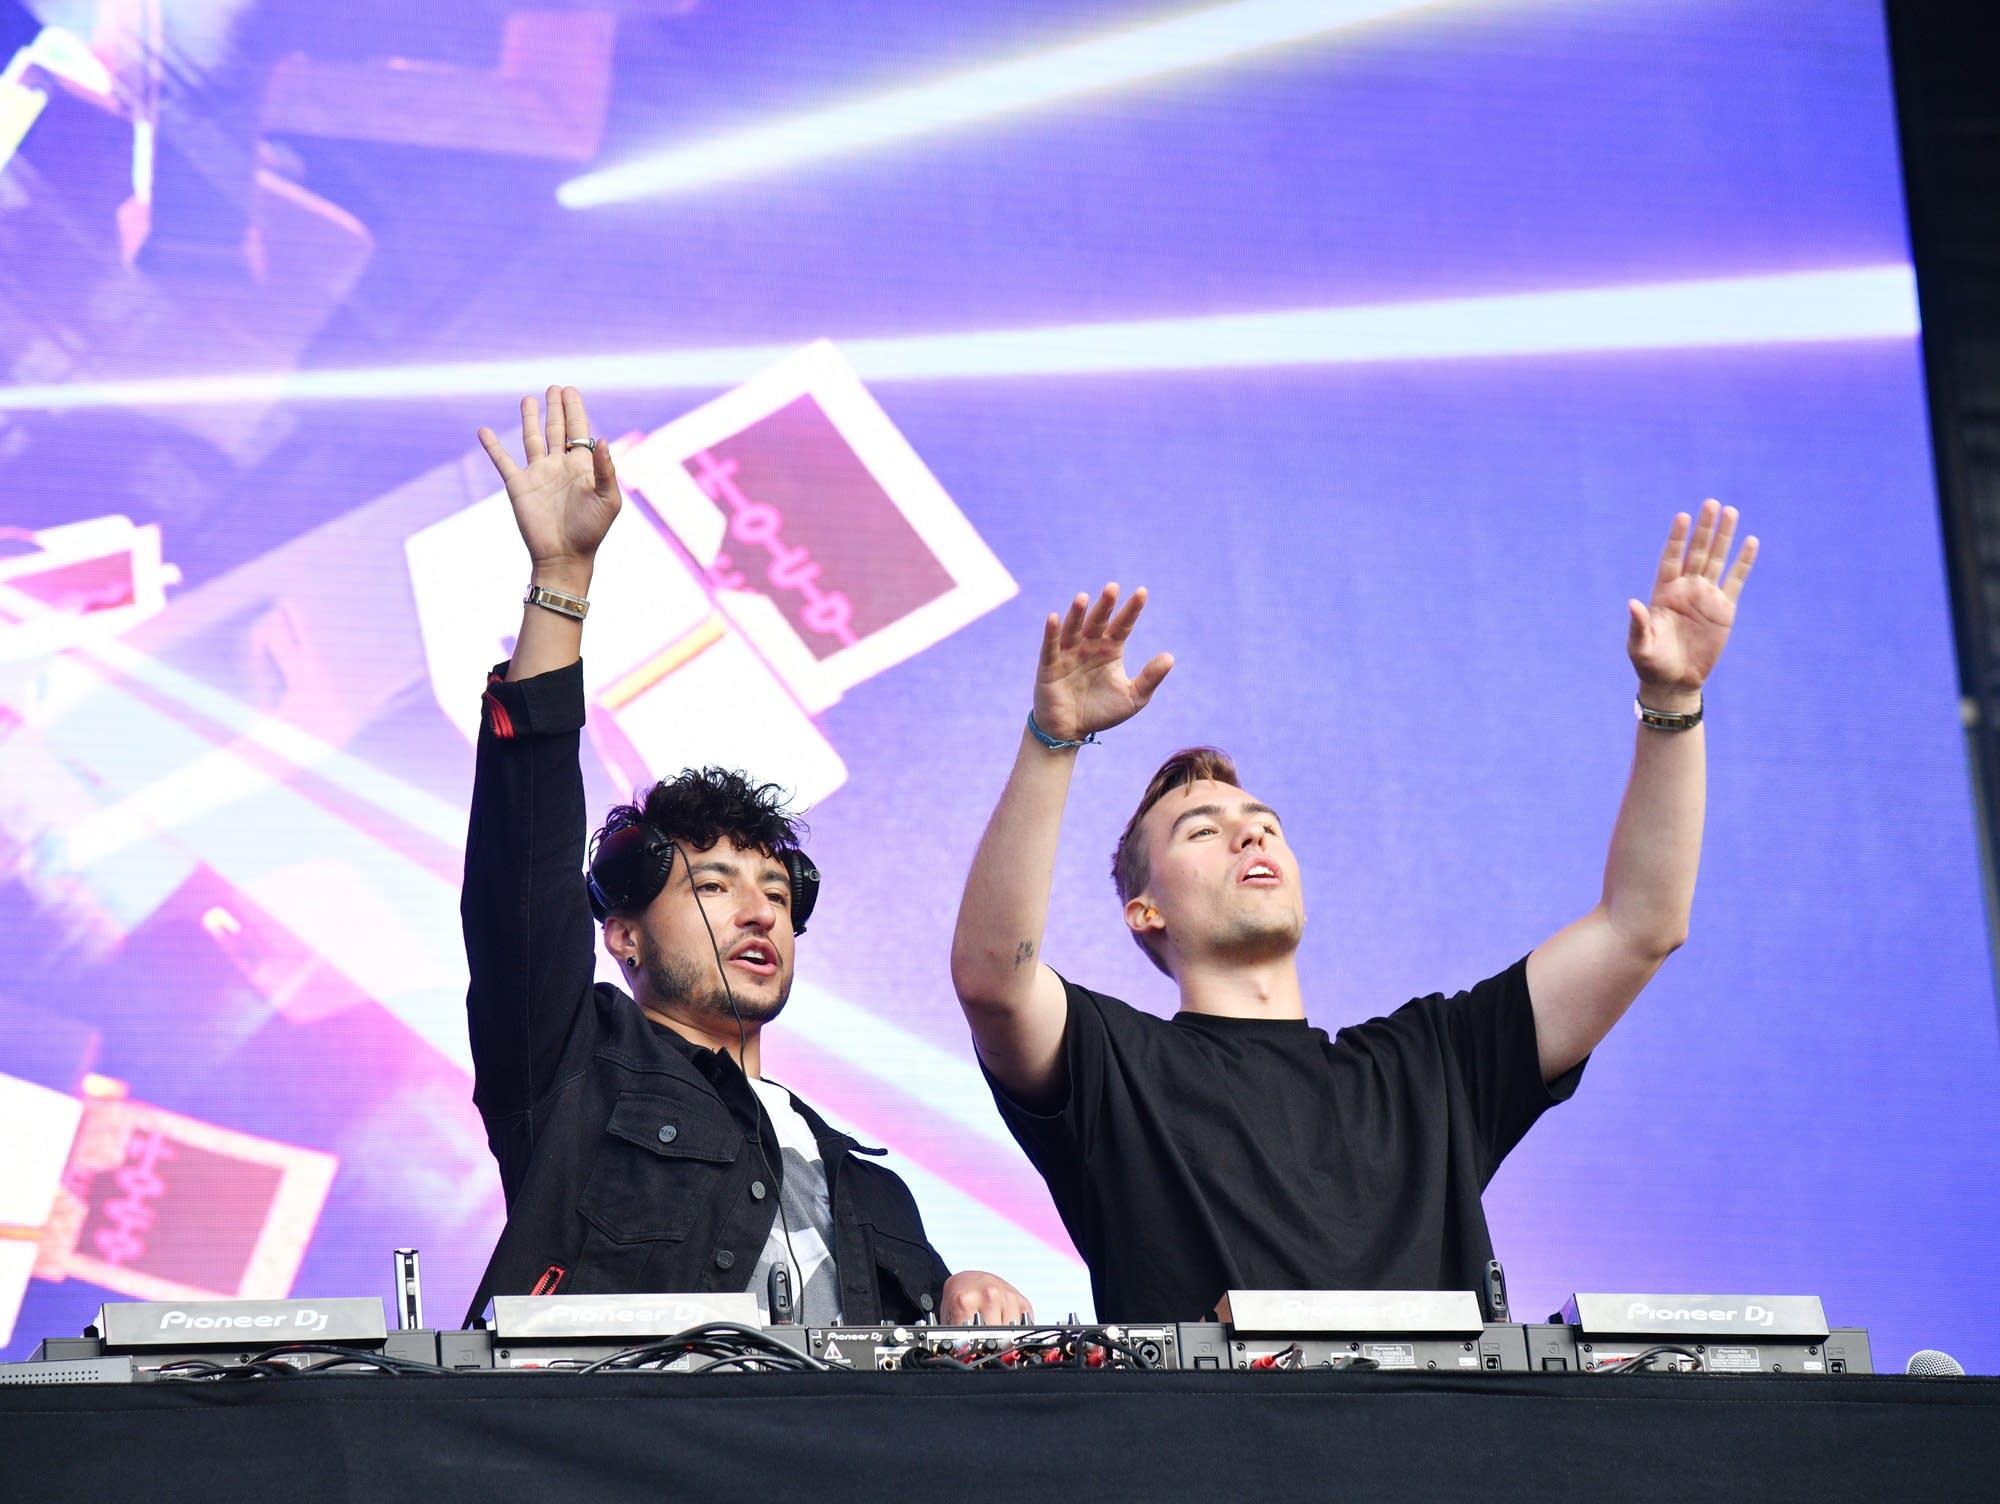 Loud Luxury performs for 2019 103.5 KTU KTUphoria